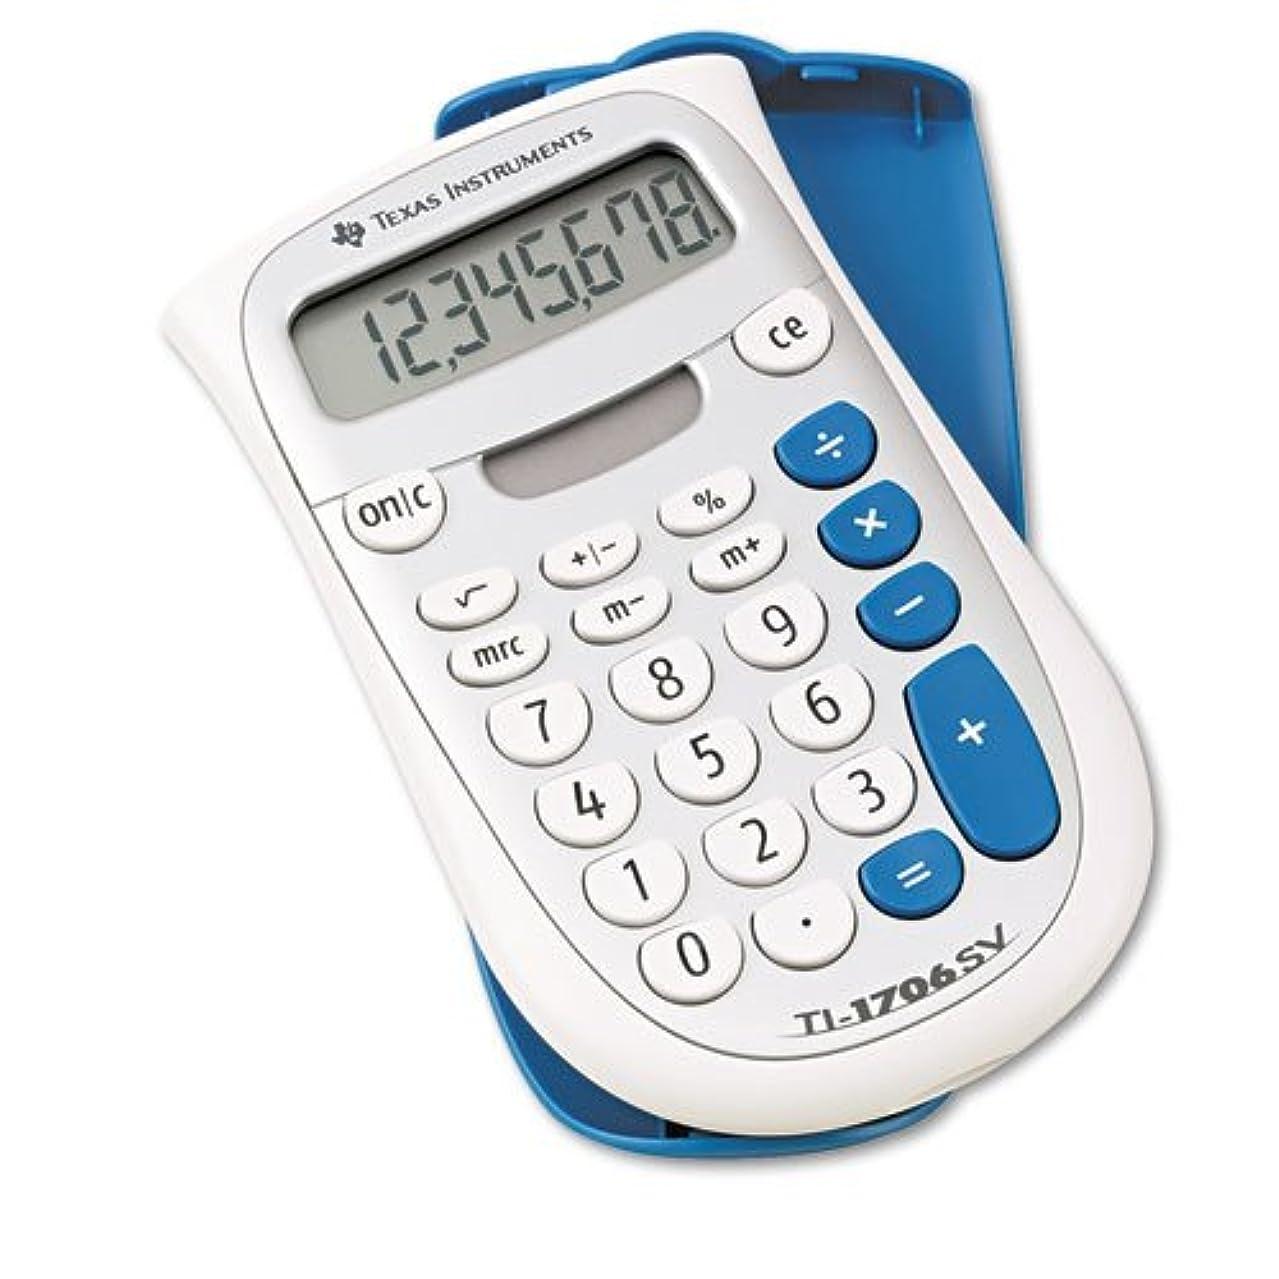 Texas Instruments - TI-1706SV Handheld Pocket Calculator, 8-Digit LCD TI-1706SV (DMi EA